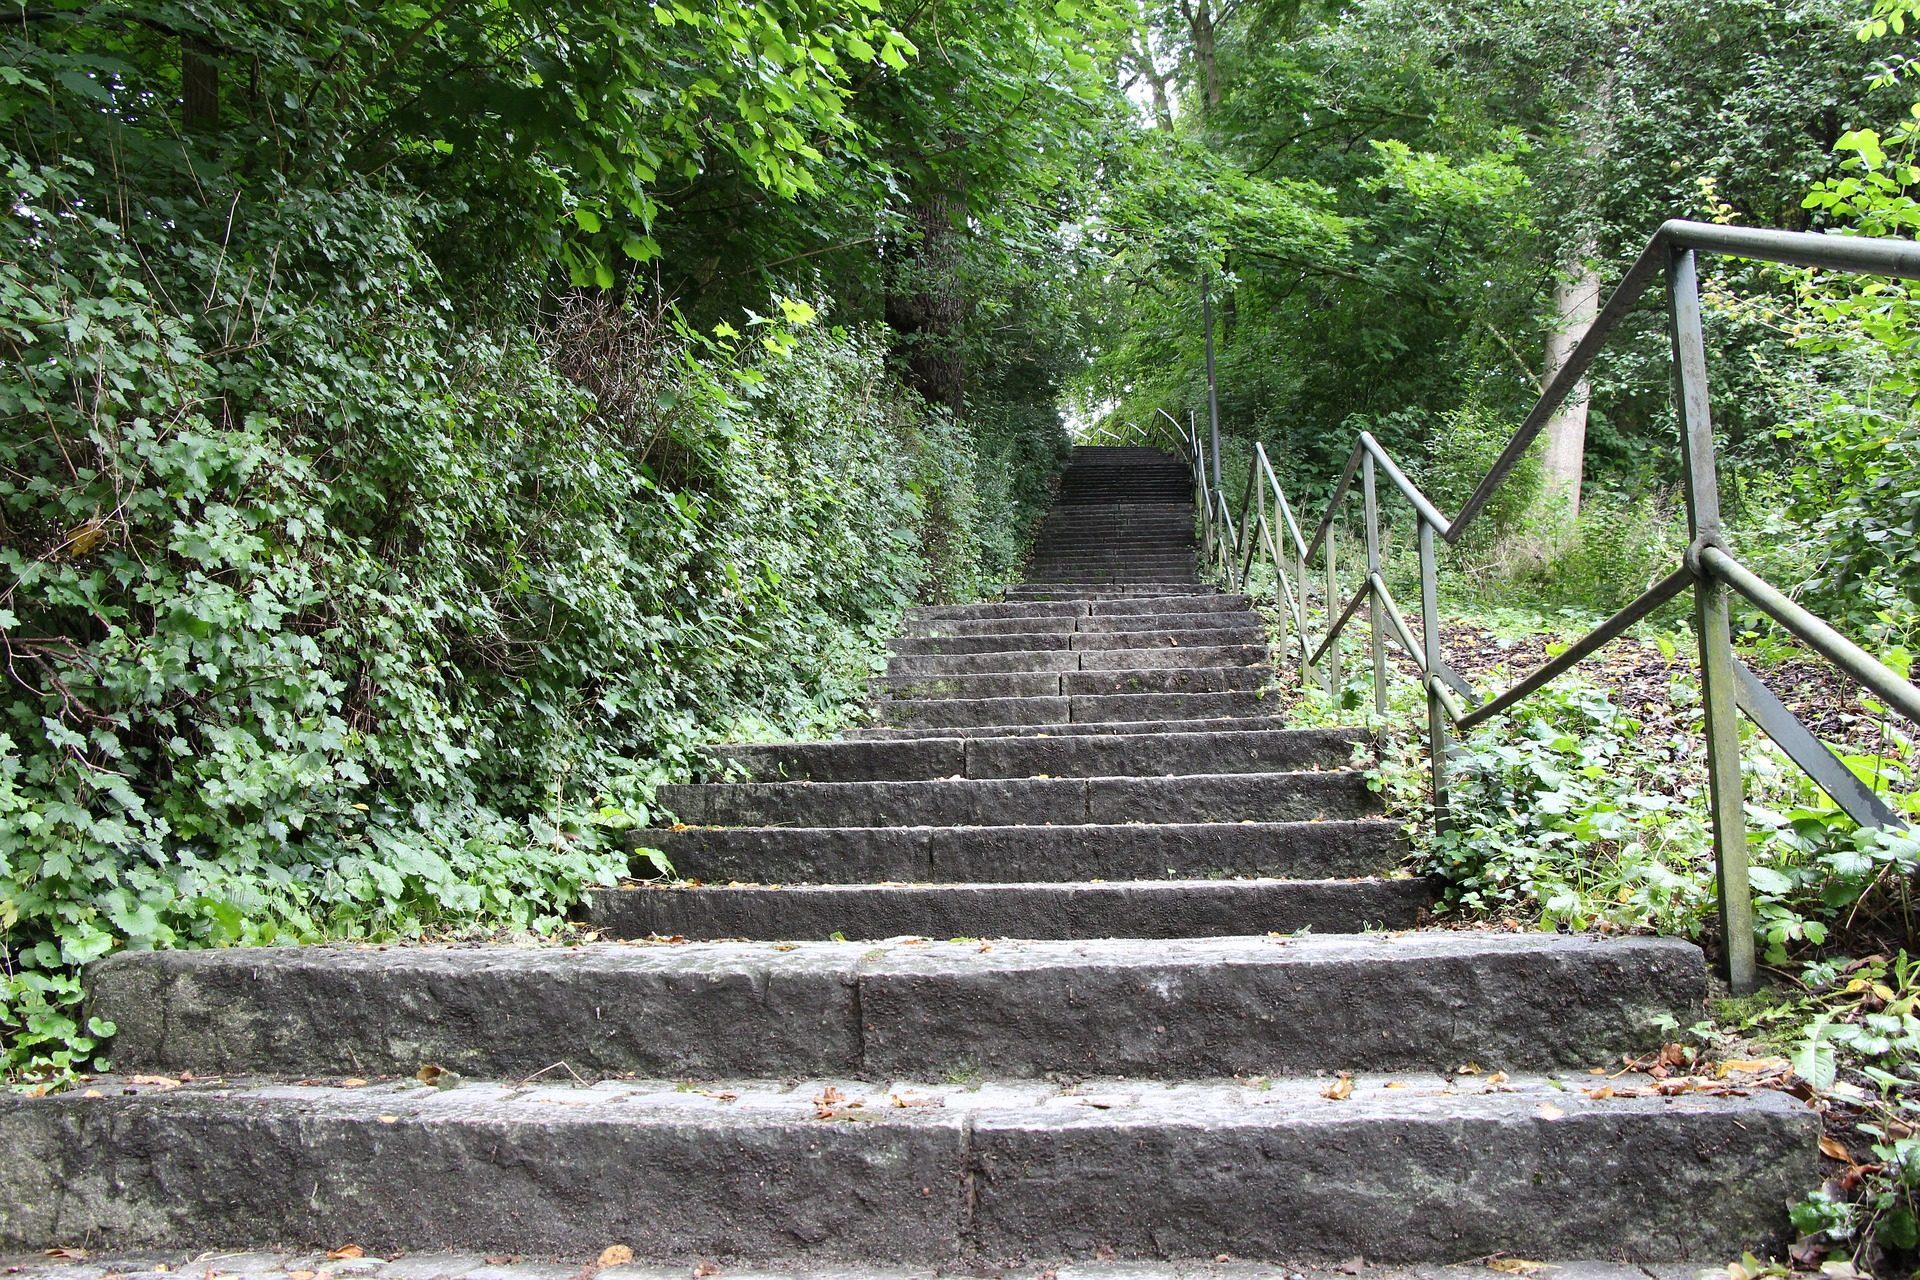 escaliers, girons d'escalier, varandilla, passage, Forest, Parc - Fonds d'écran HD - Professor-falken.com